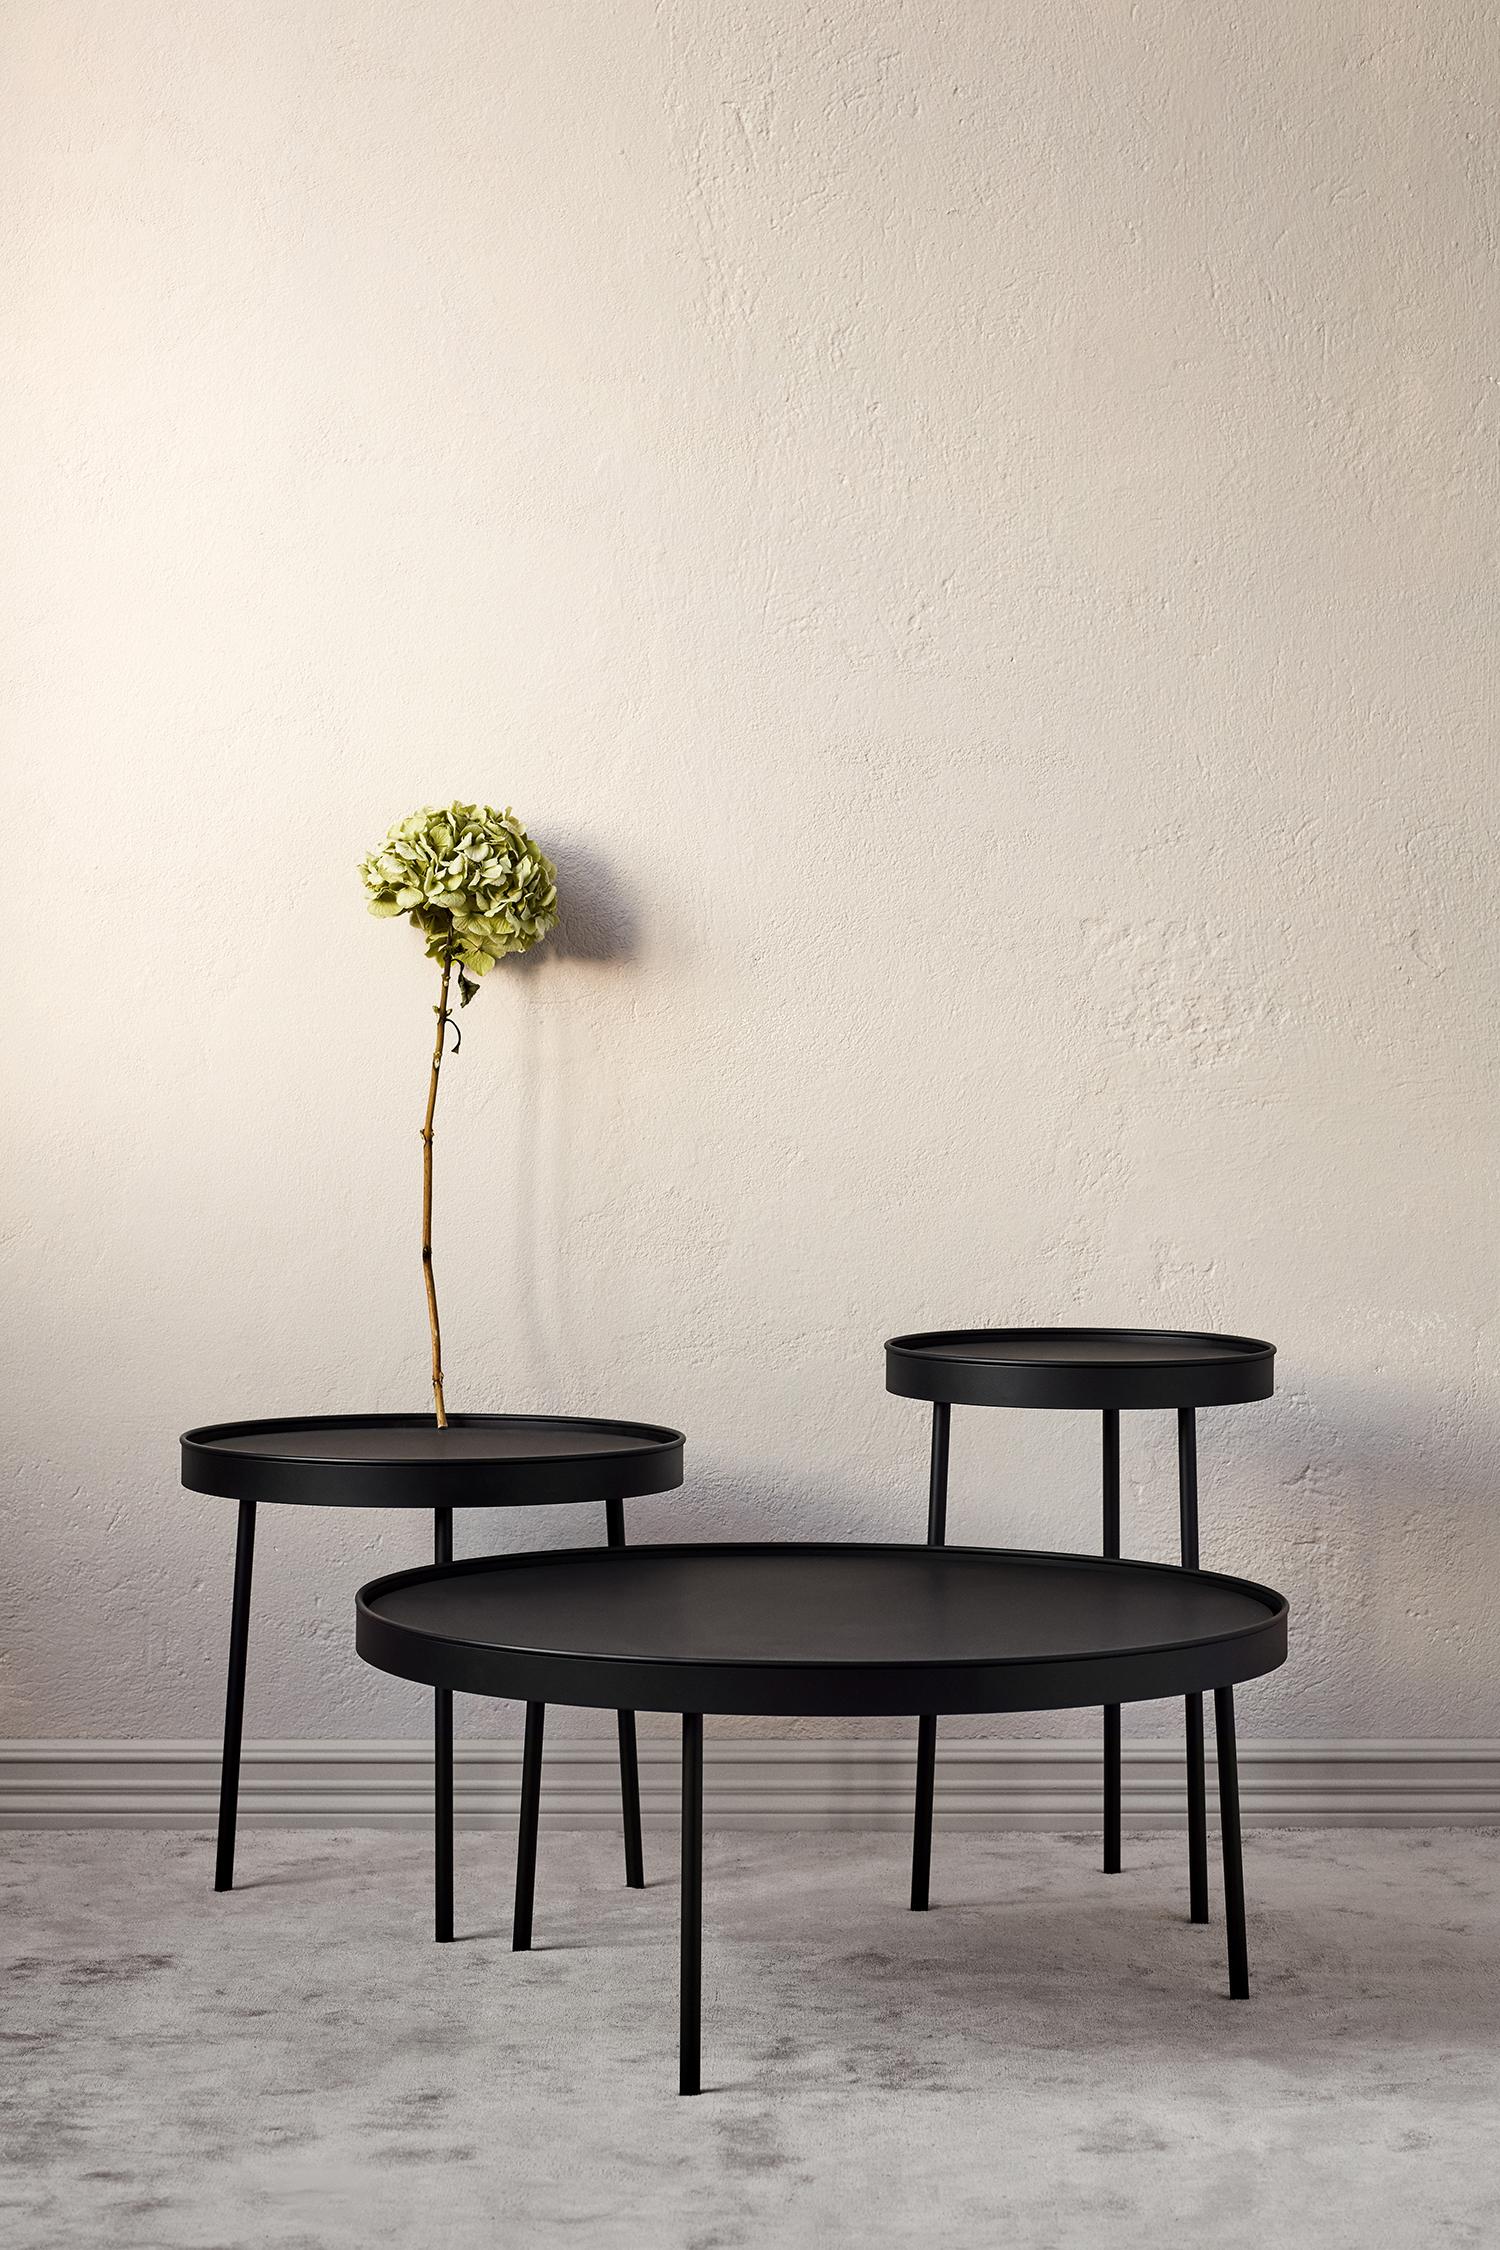 Stilk_tables_all-Northern_Photo_Chris_-Tonnesen-High-res.jpg